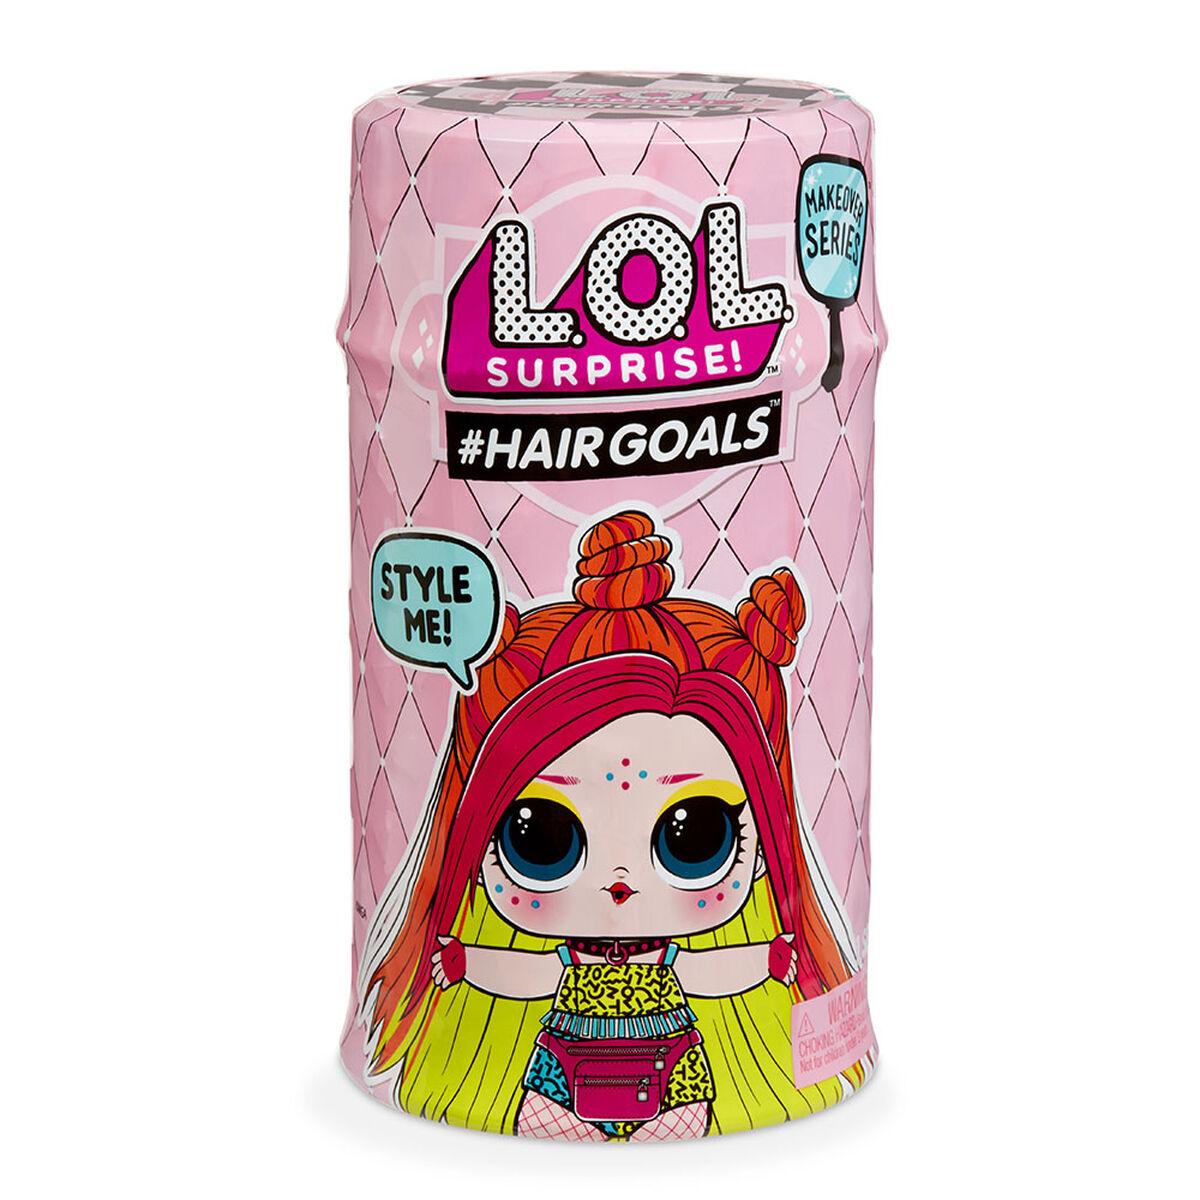 LOL Hairgoals